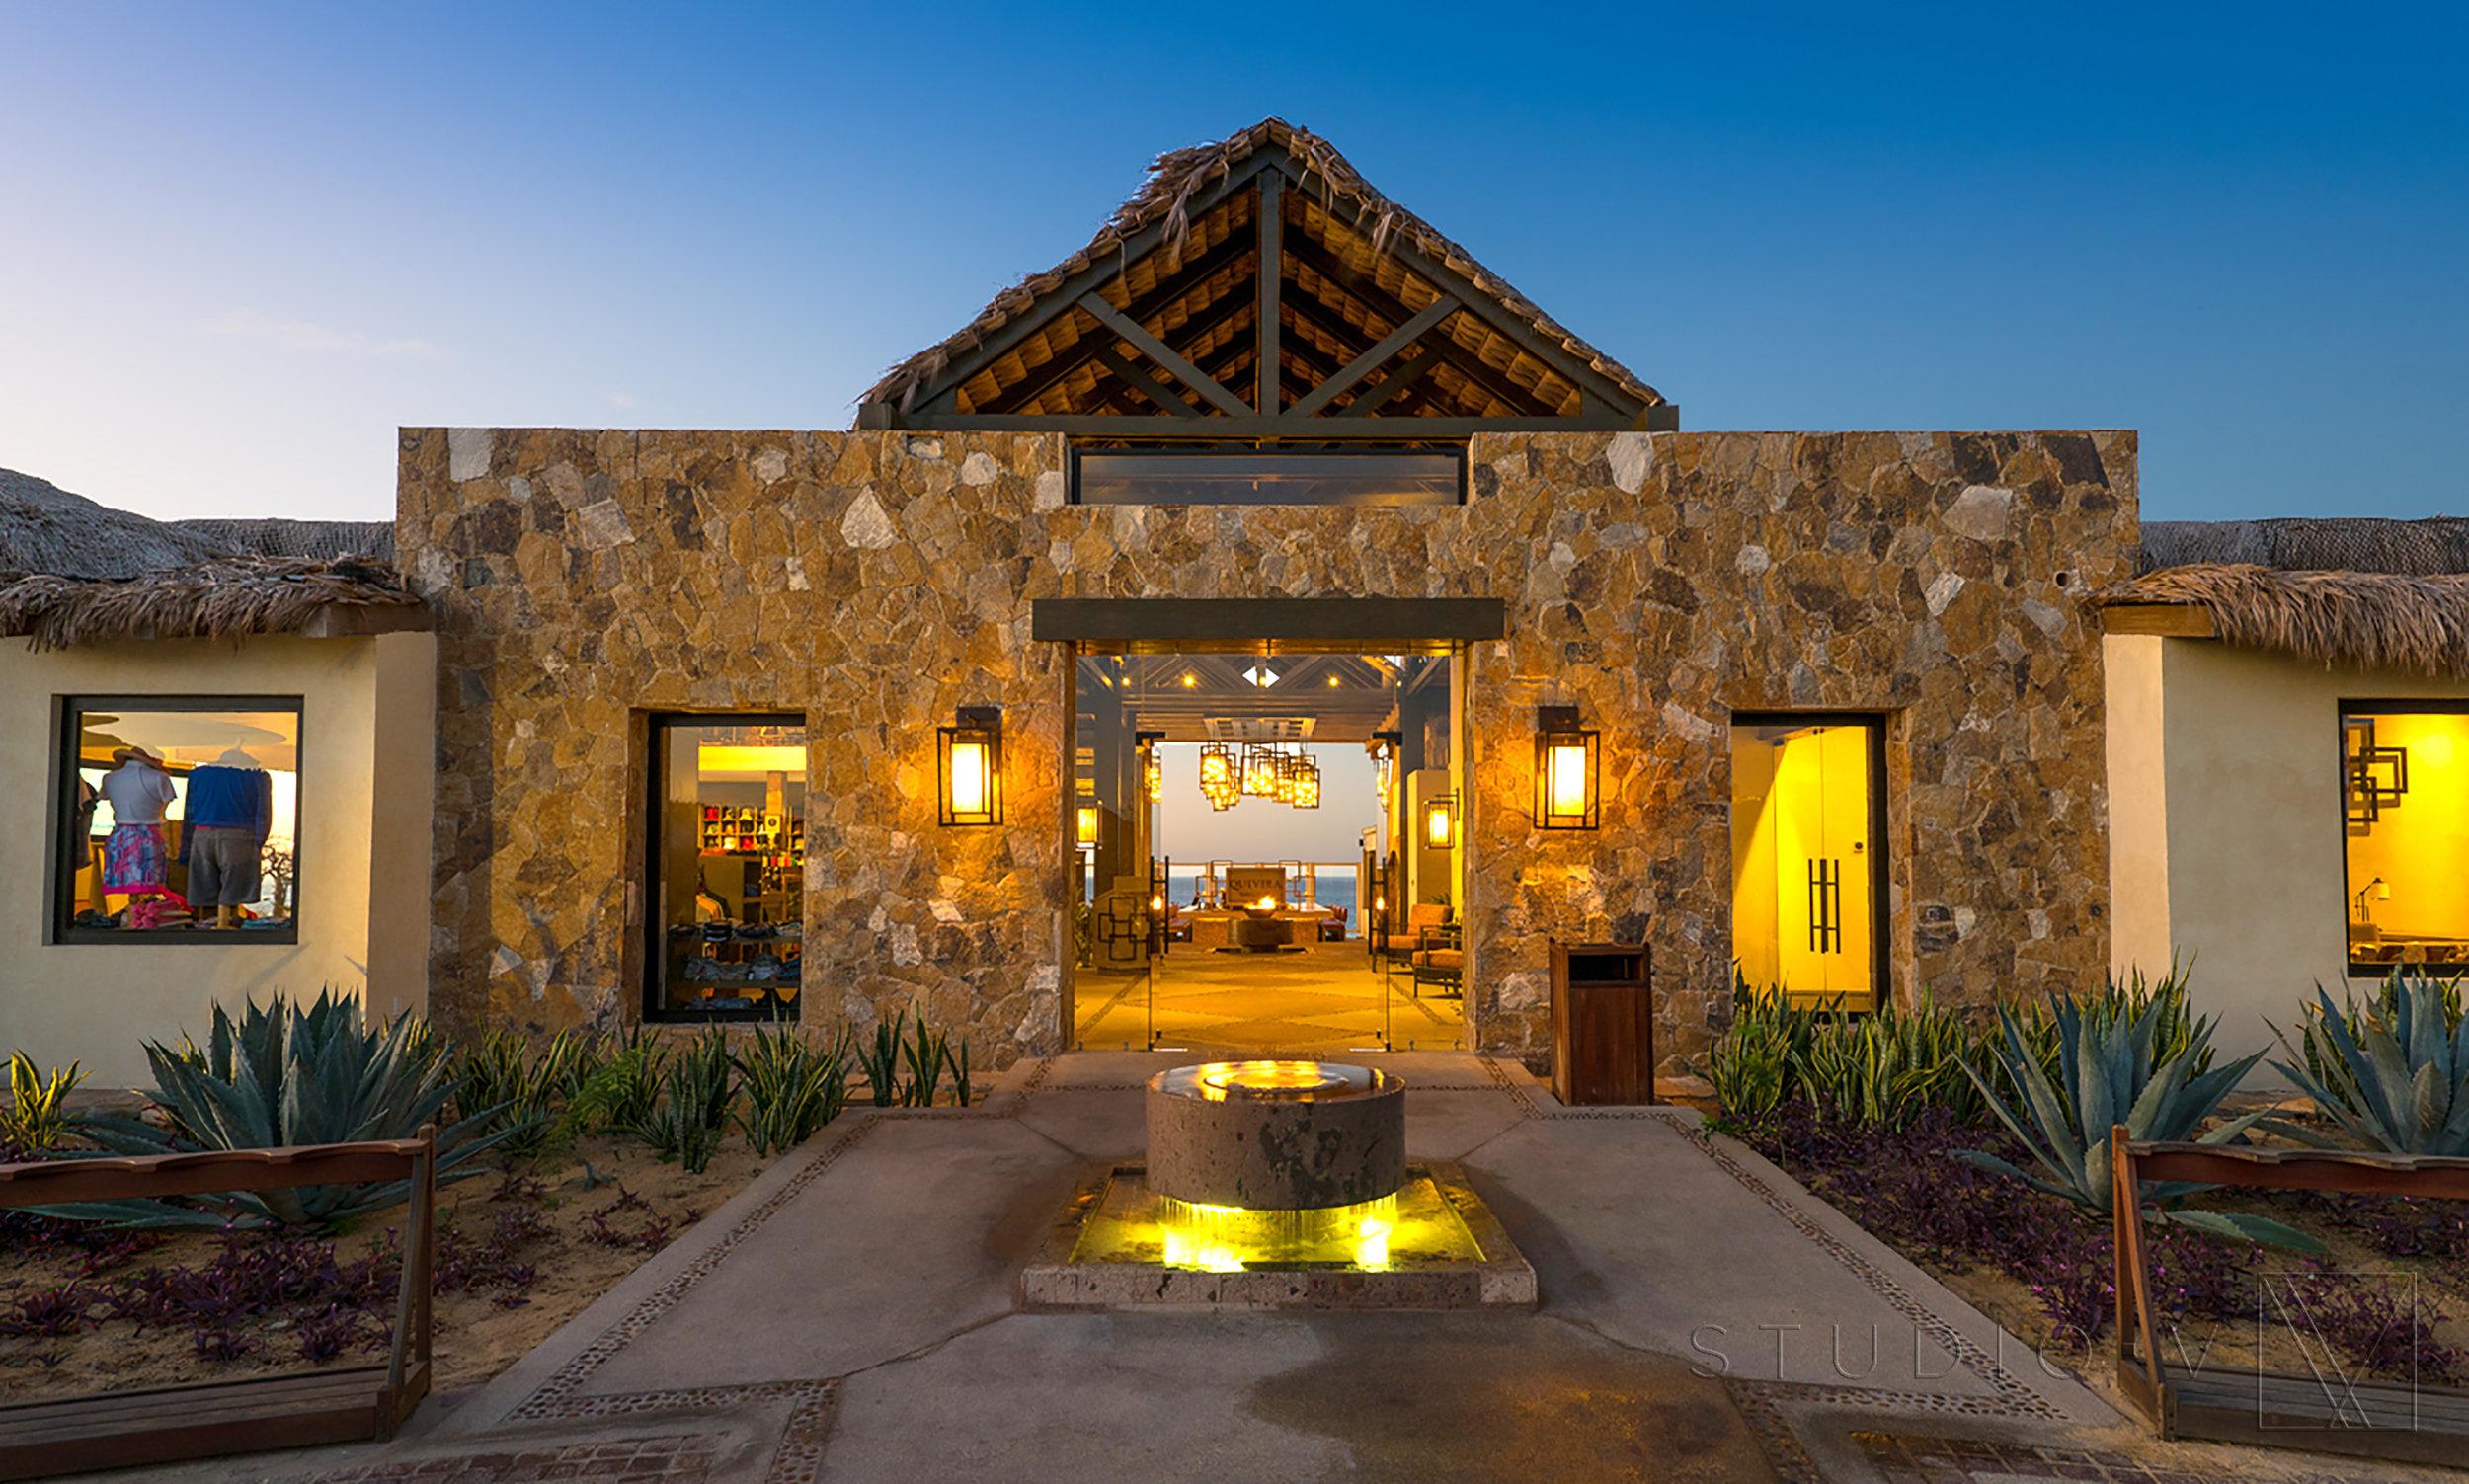 Quivira Clubhouse Sunset Beach Cabo San Lucas Studio V Interior Architecture and Design Scottsdale Arizona AZ (11).jpg